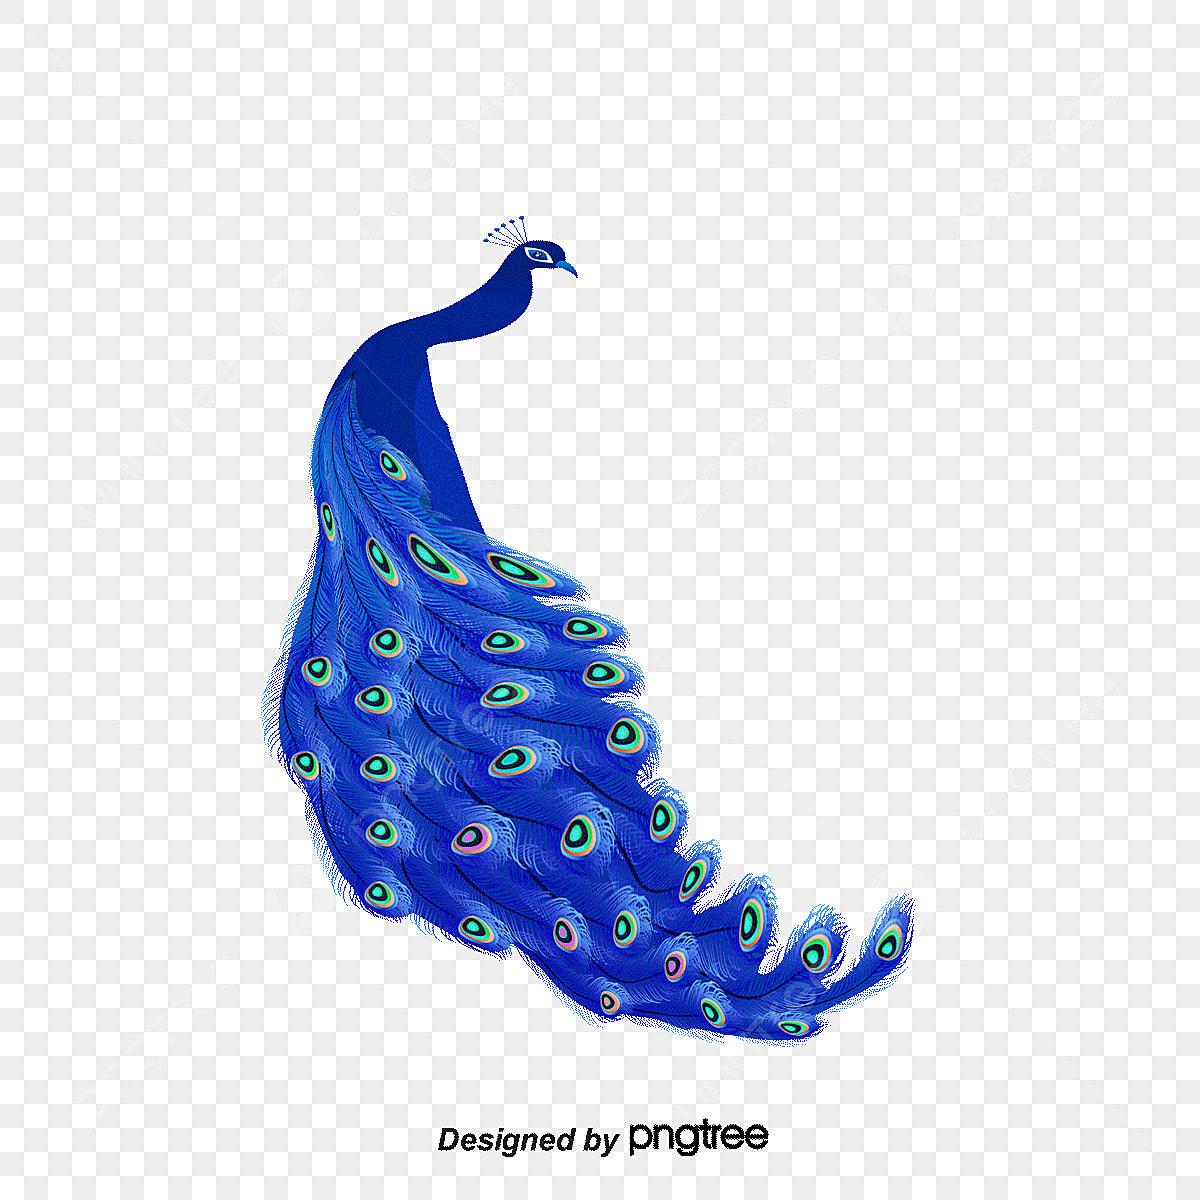 Vector Azul Pavao Animais Dos Desenhos Animados Ilustracao De